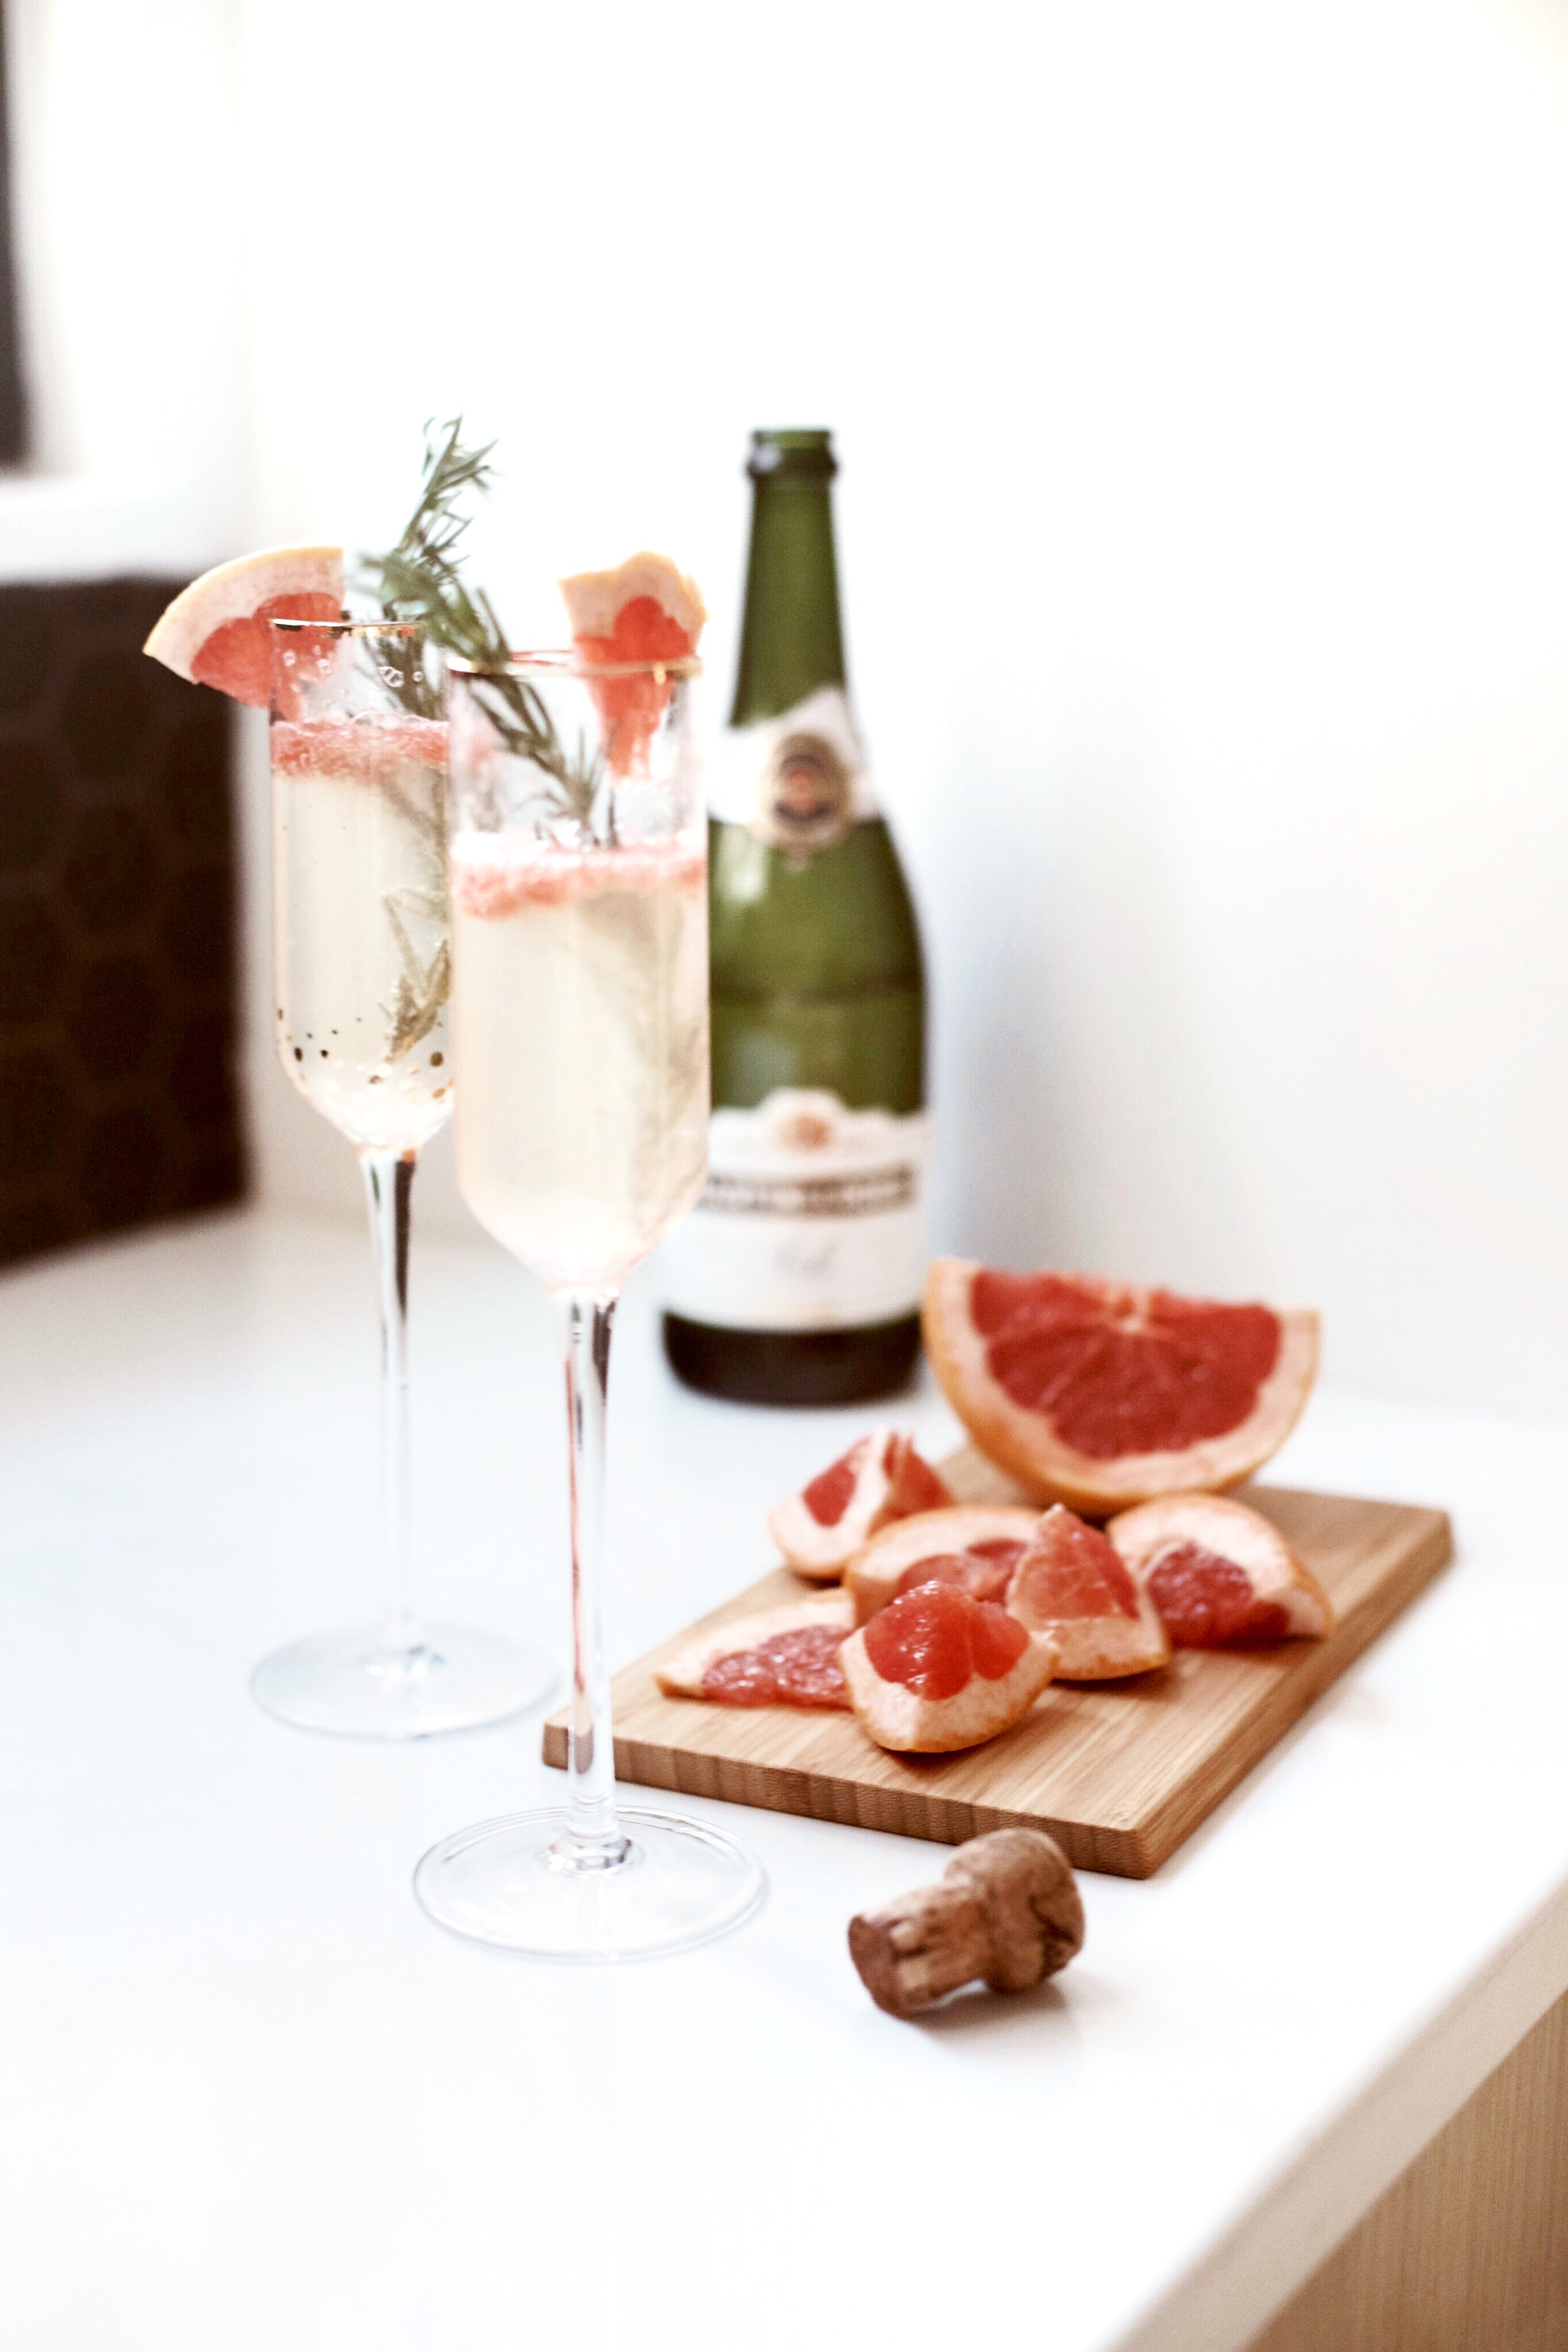 Rosemary Grapefruit Prosecco   |   Gypsy Drinks